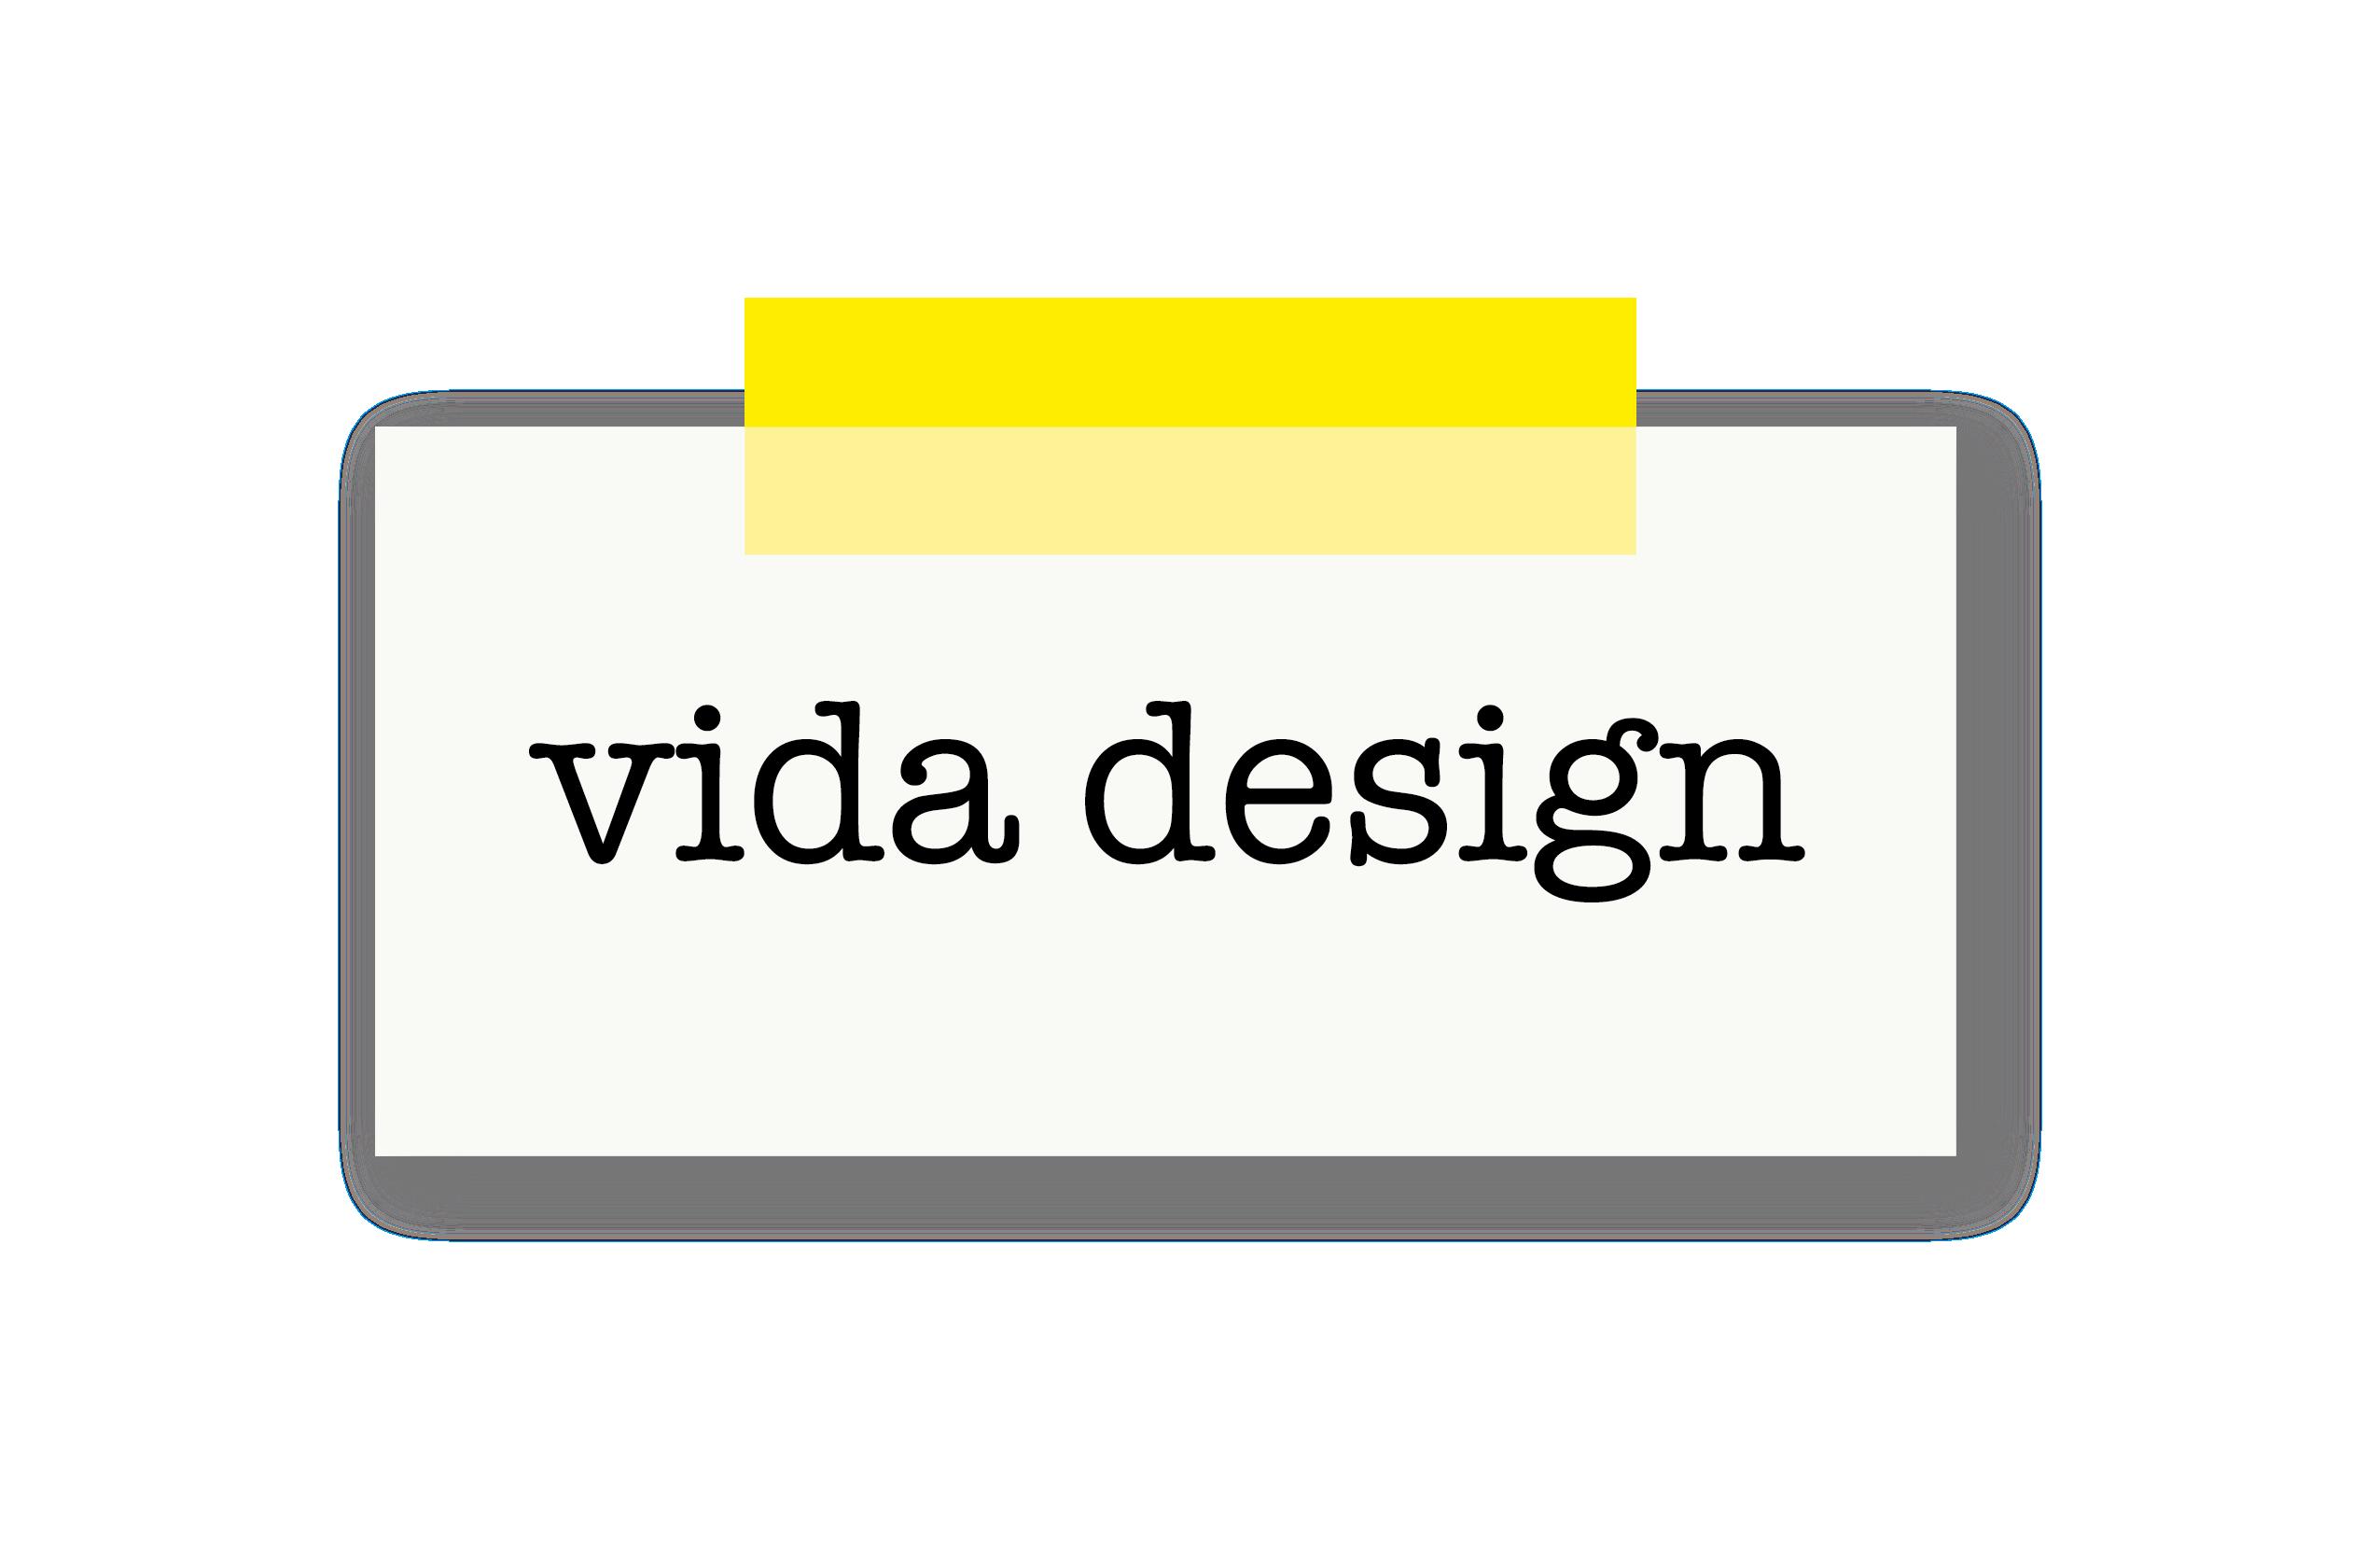 vida design